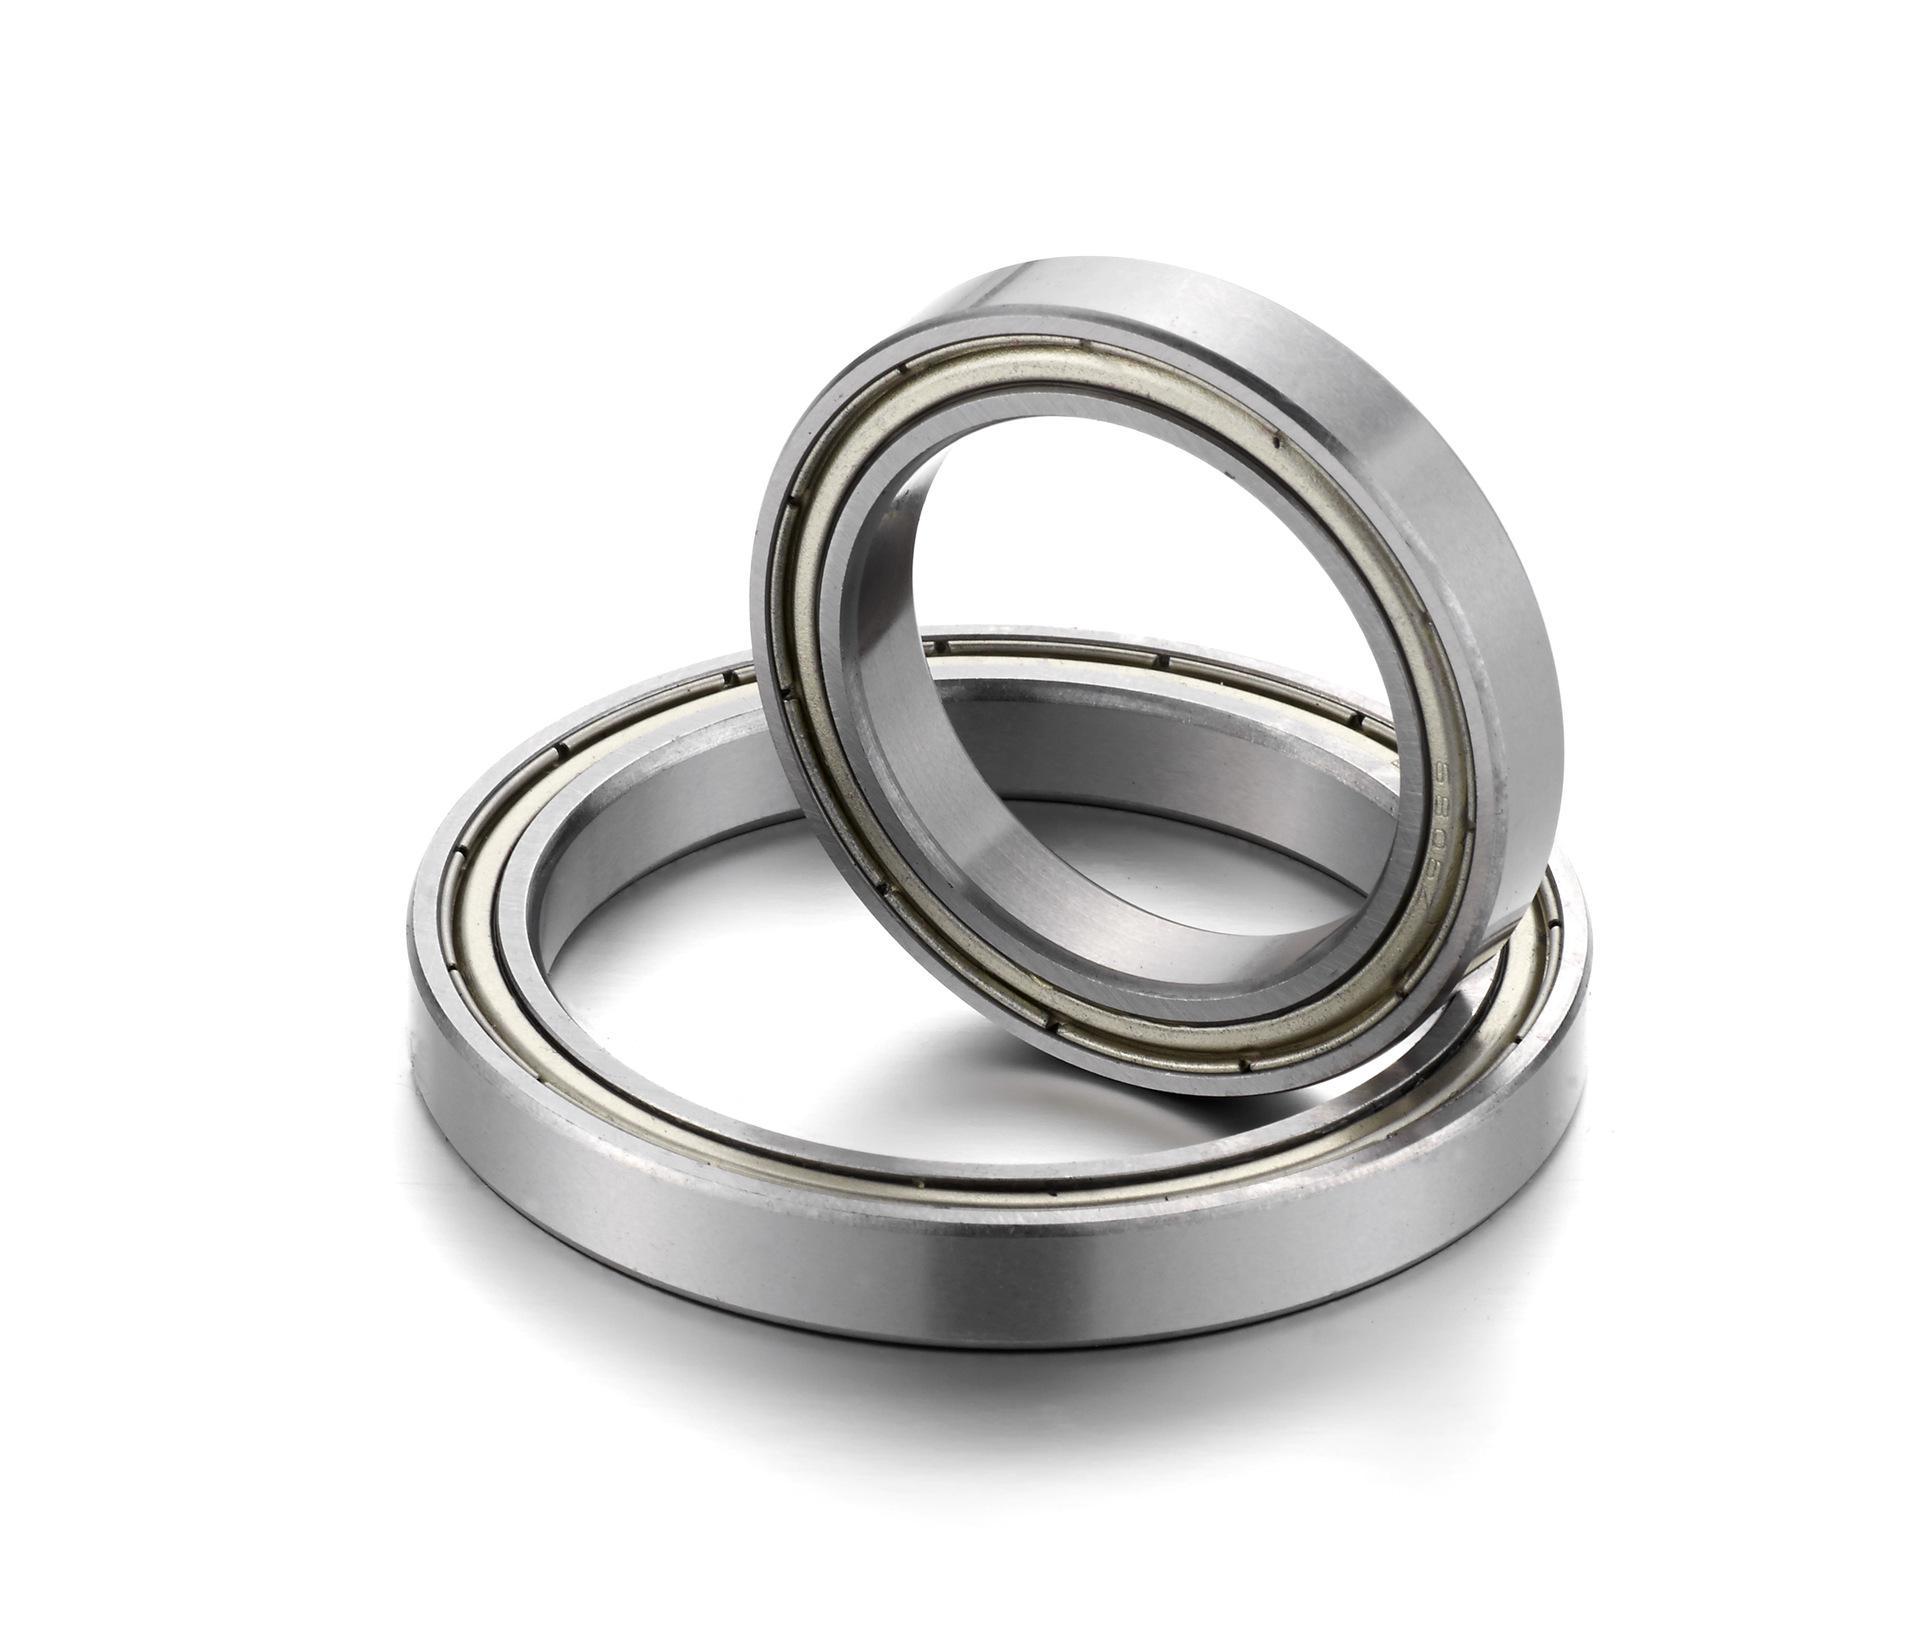 6813ZZ ABEC-1 (4PCS)  65x85x10MM  Metric Thin Section Bearings 61813Z 6813ZZ 1pcs 71901 71901cd p4 7901 12x24x6 mochu thin walled miniature angular contact bearings speed spindle bearings cnc abec 7